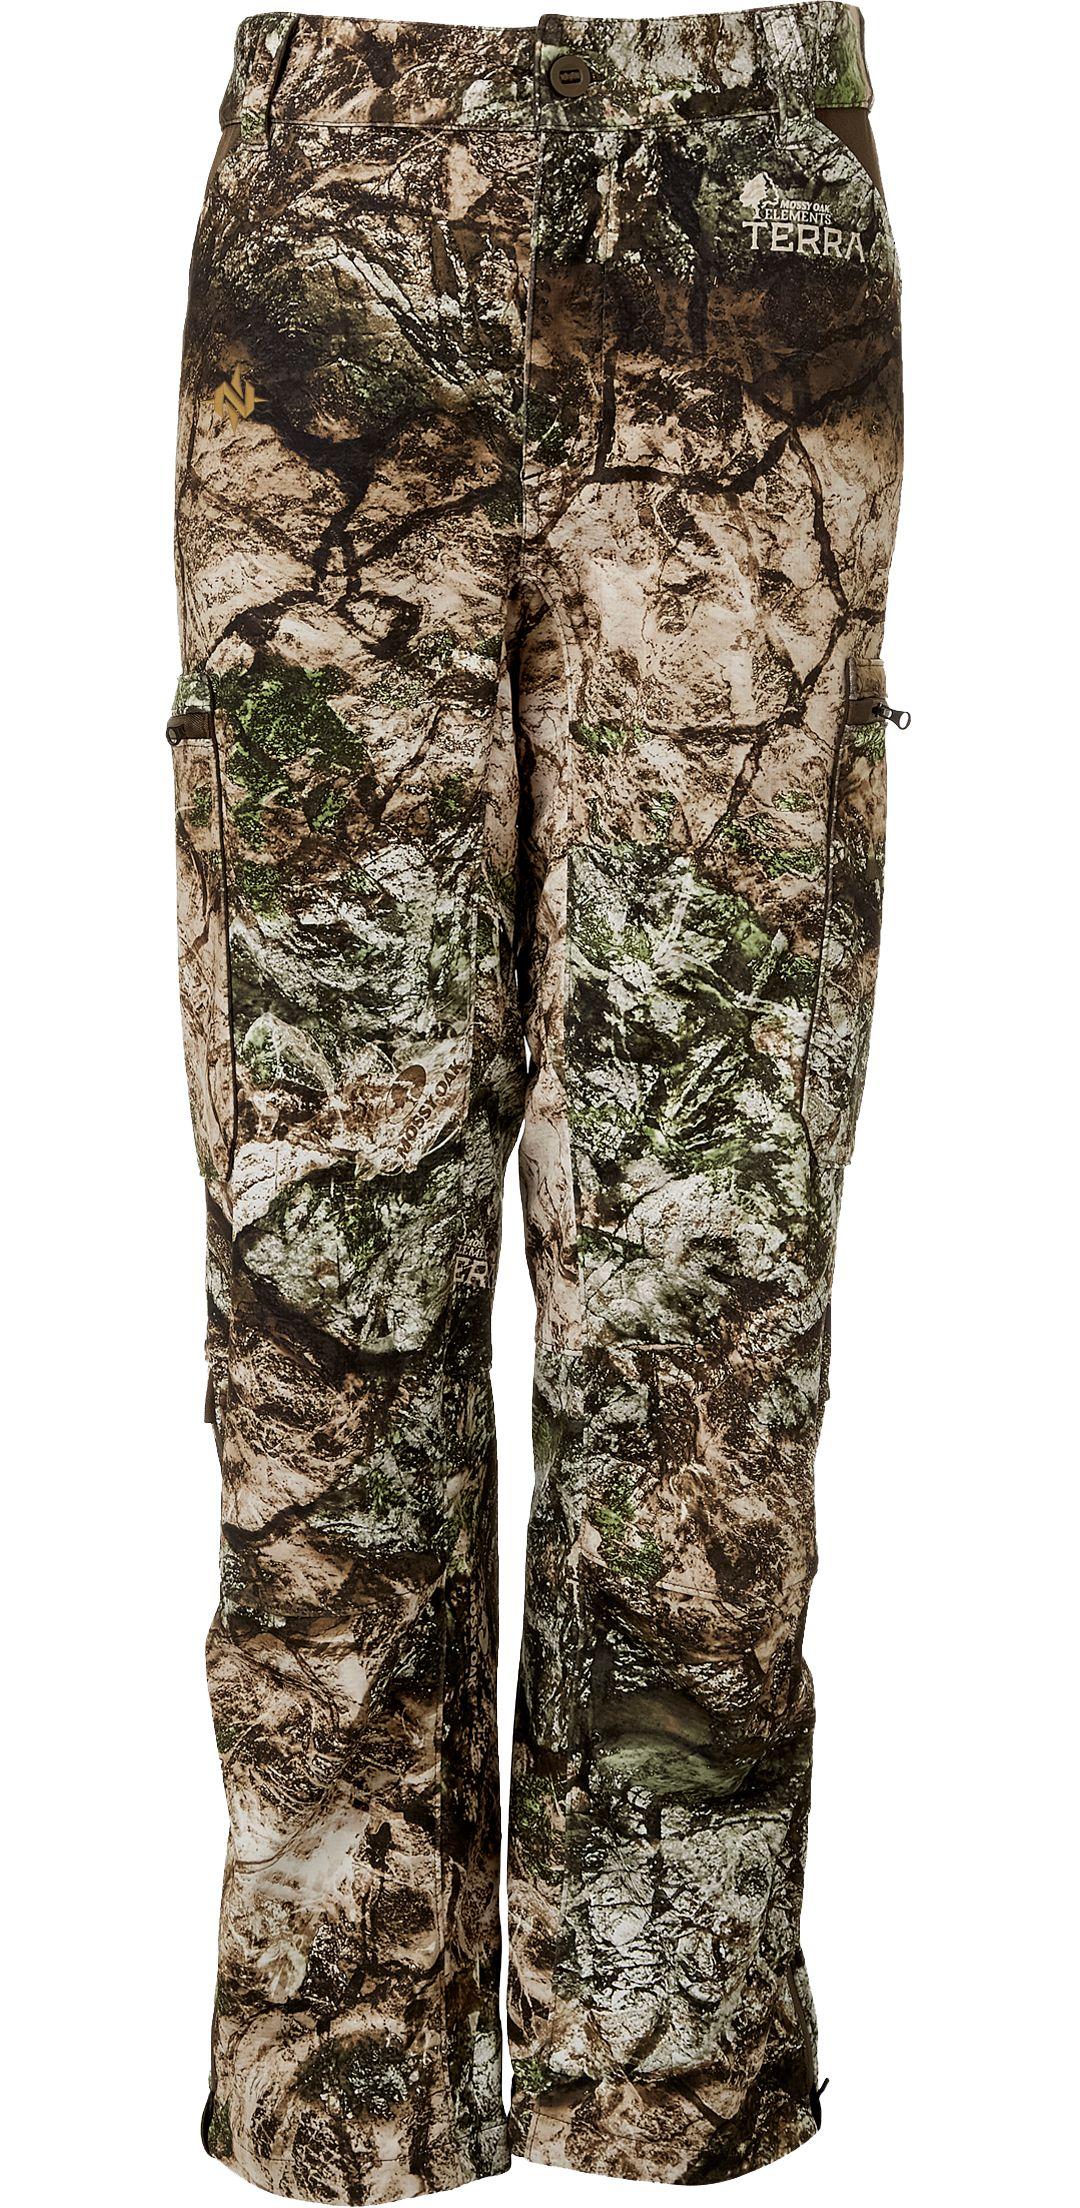 6cd5f437fbb1a NOMAD Men's Mid Season Hunting Pants | DICK'S Sporting Goods